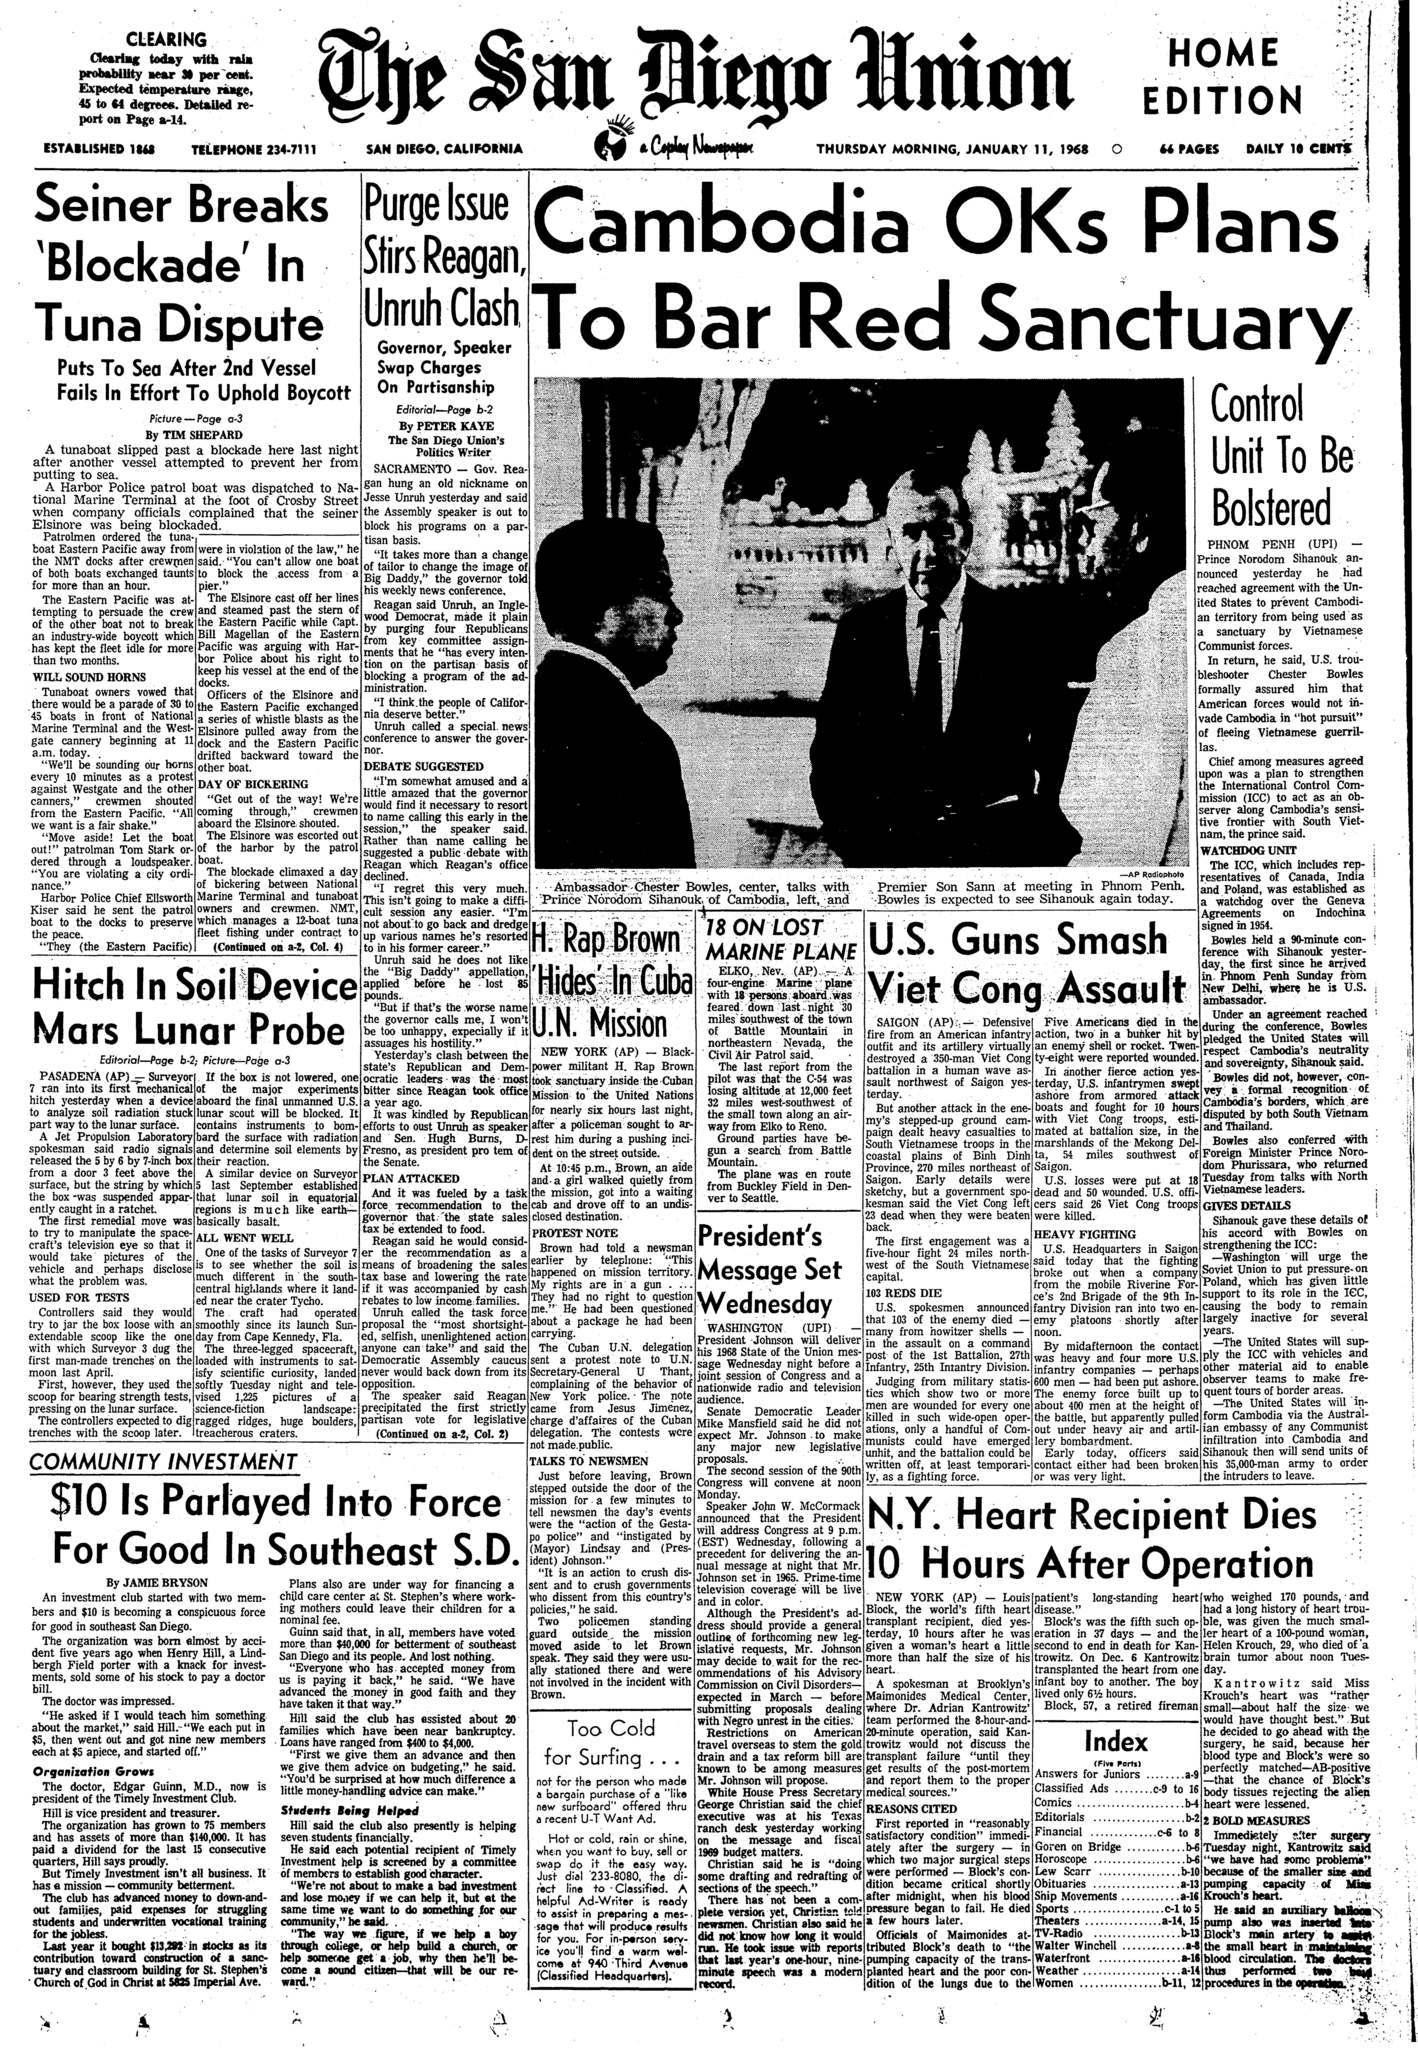 January 11, 1968